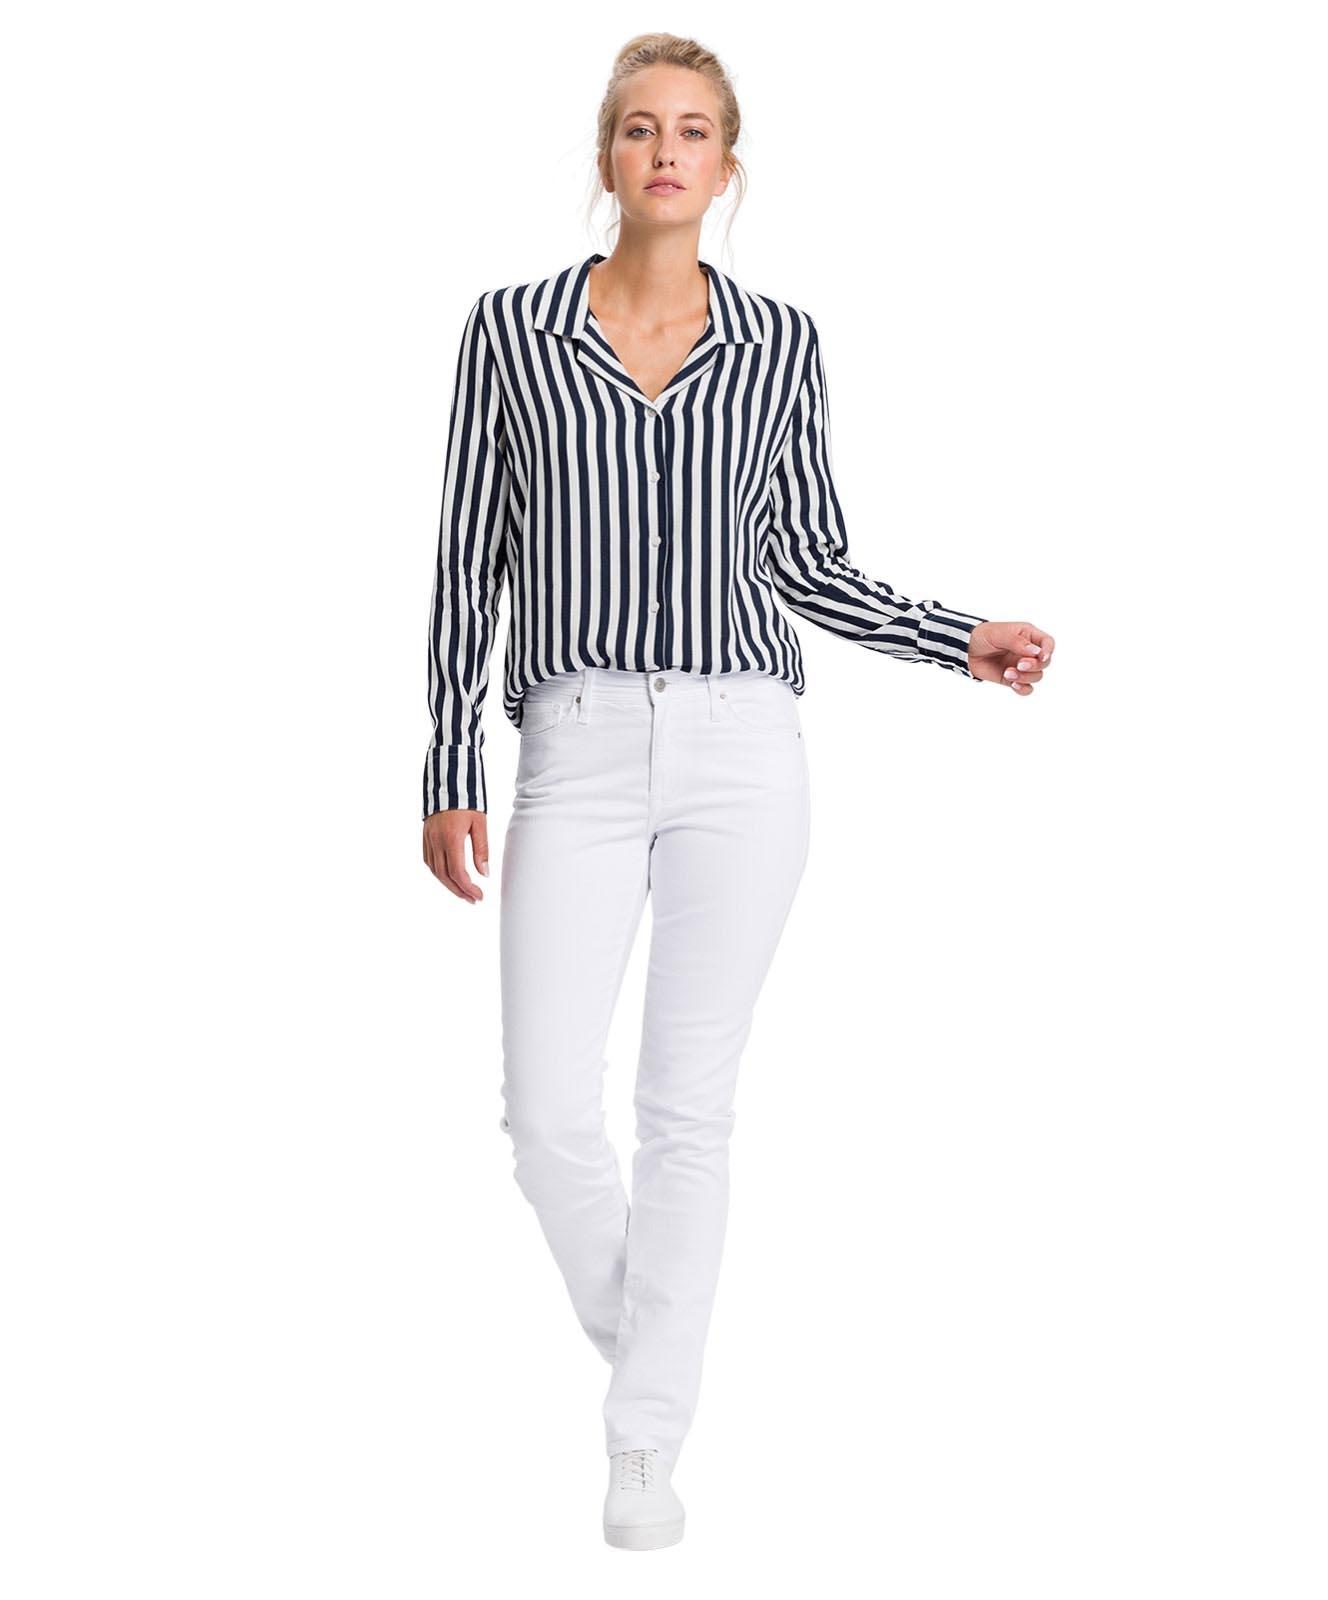 Hosen - Cross Mom Jeans Anya in White  - Onlineshop Jeans Meile